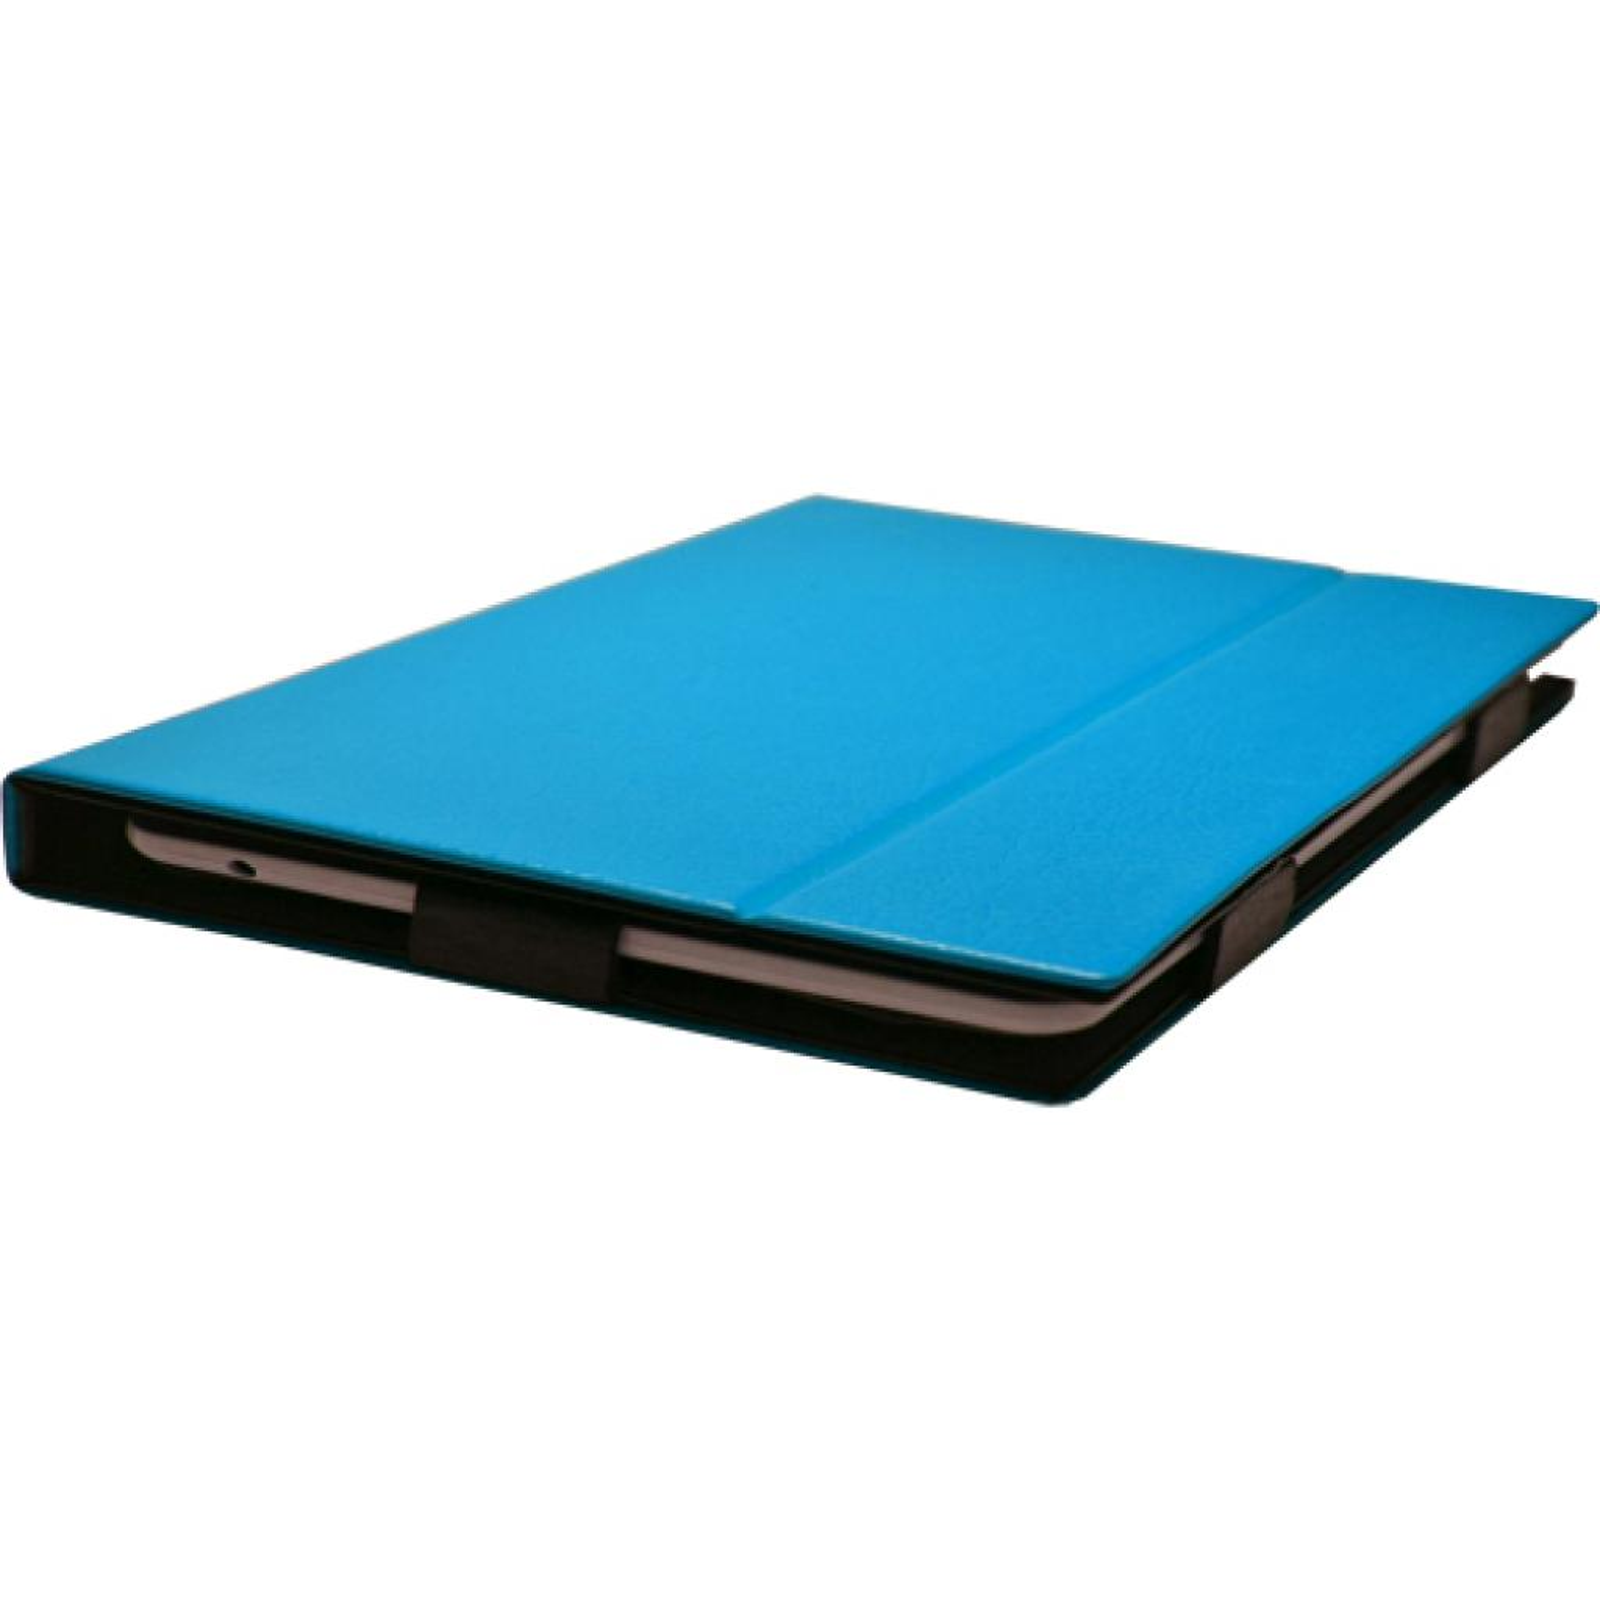 Чехол для планшета Vento 9.7 Desire Bright -blue изображение 3